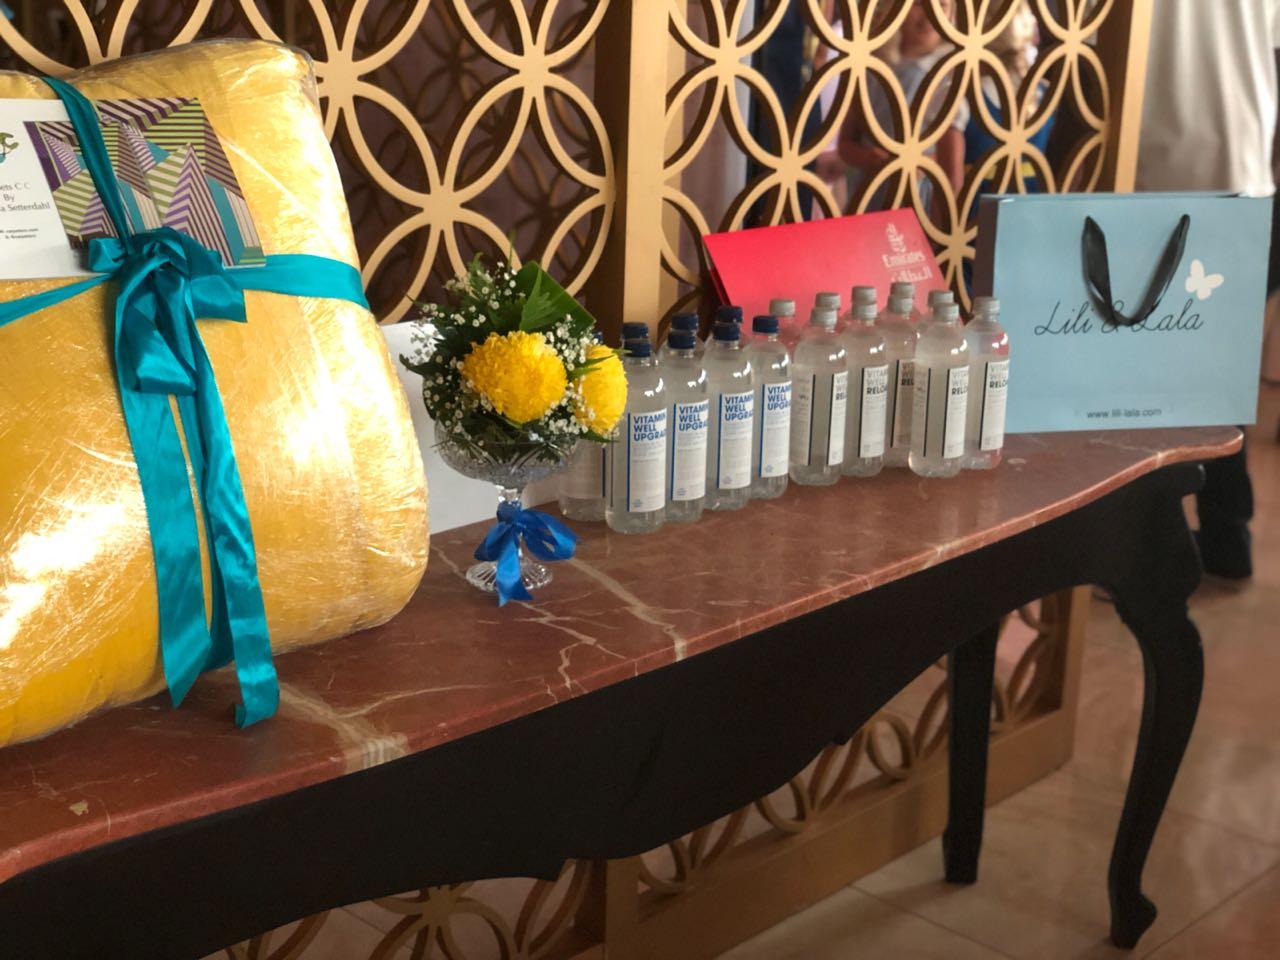 Prizes sponsored by Emirates, CarpetCC, Lili & Lala and IKEA